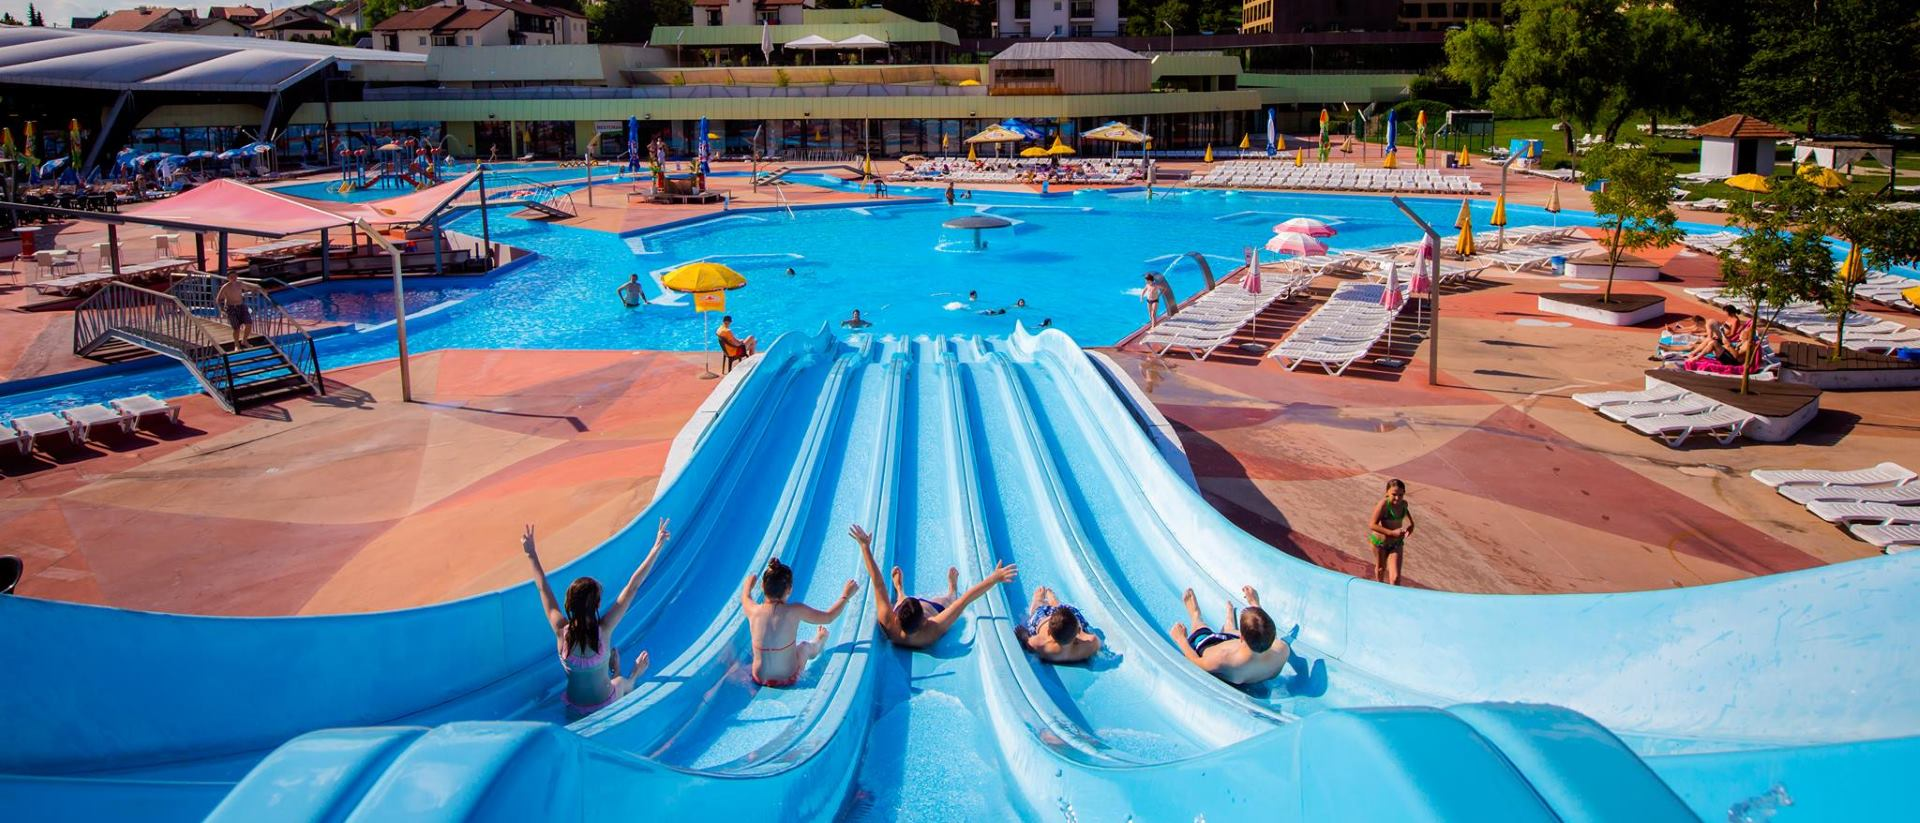 FOTO: Natali Dizdar i Marija Borić najavile Splash ljeto u Termama Tuhelj